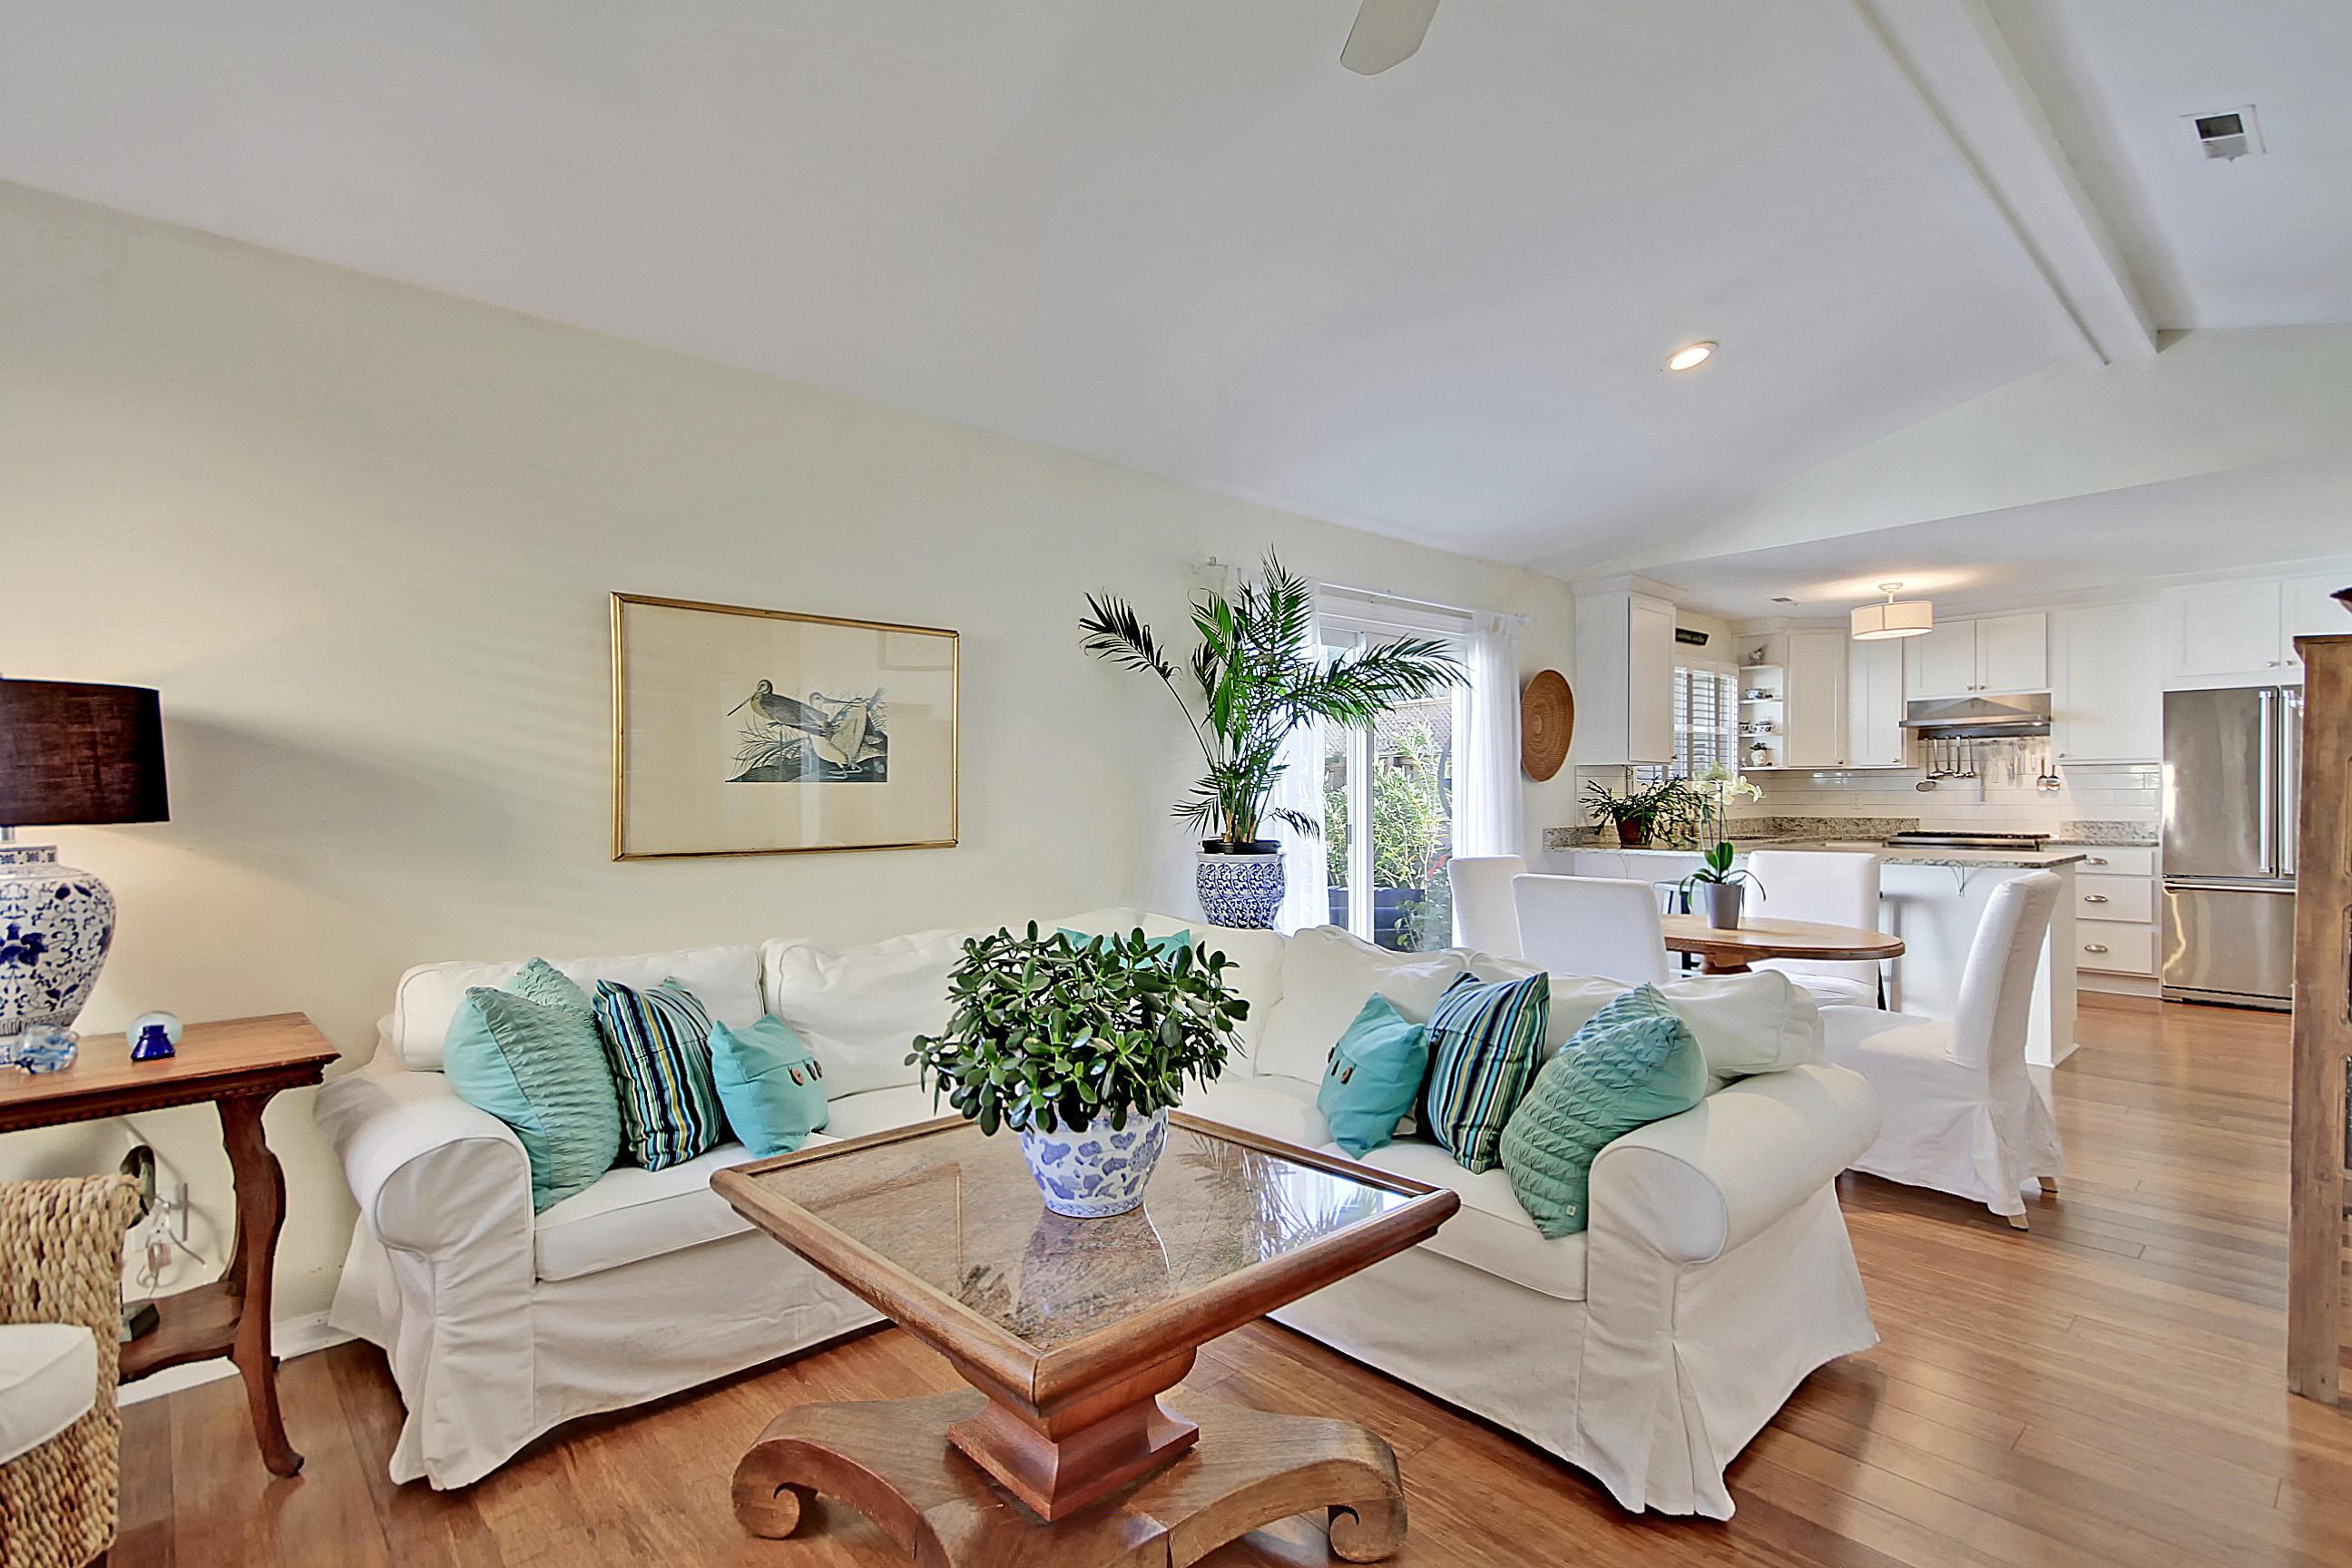 Pirates Cove Homes For Sale - 1492 Ketch, Mount Pleasant, SC - 33